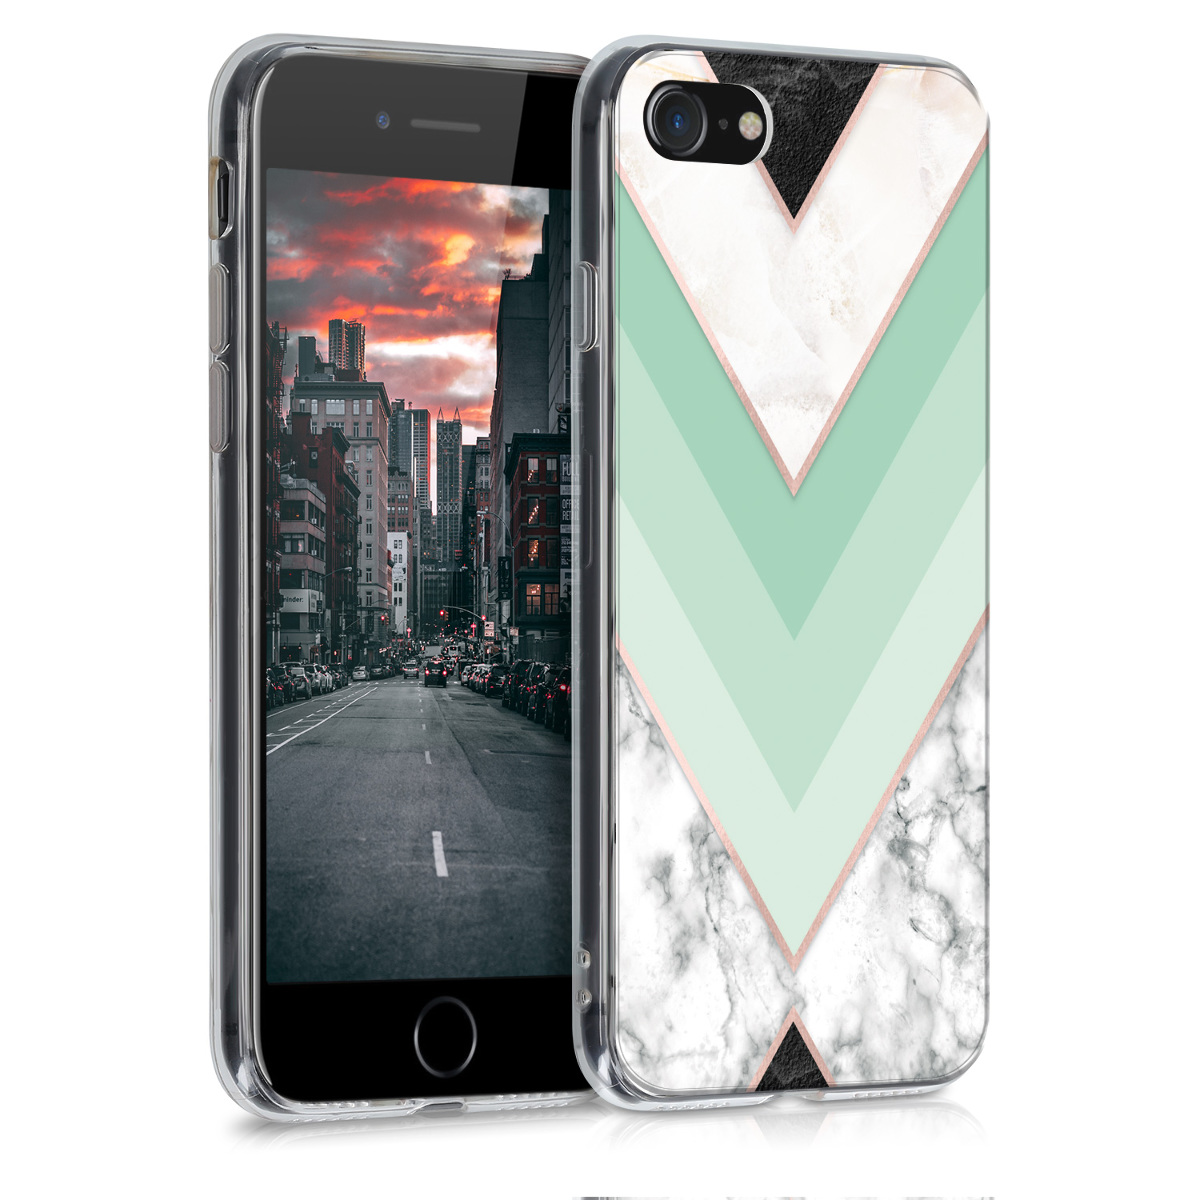 Kvalitní silikonové TPU pouzdro pro Apple iPhone 7 / 8 / SE  - Mramor Mint | Rose Gold | White